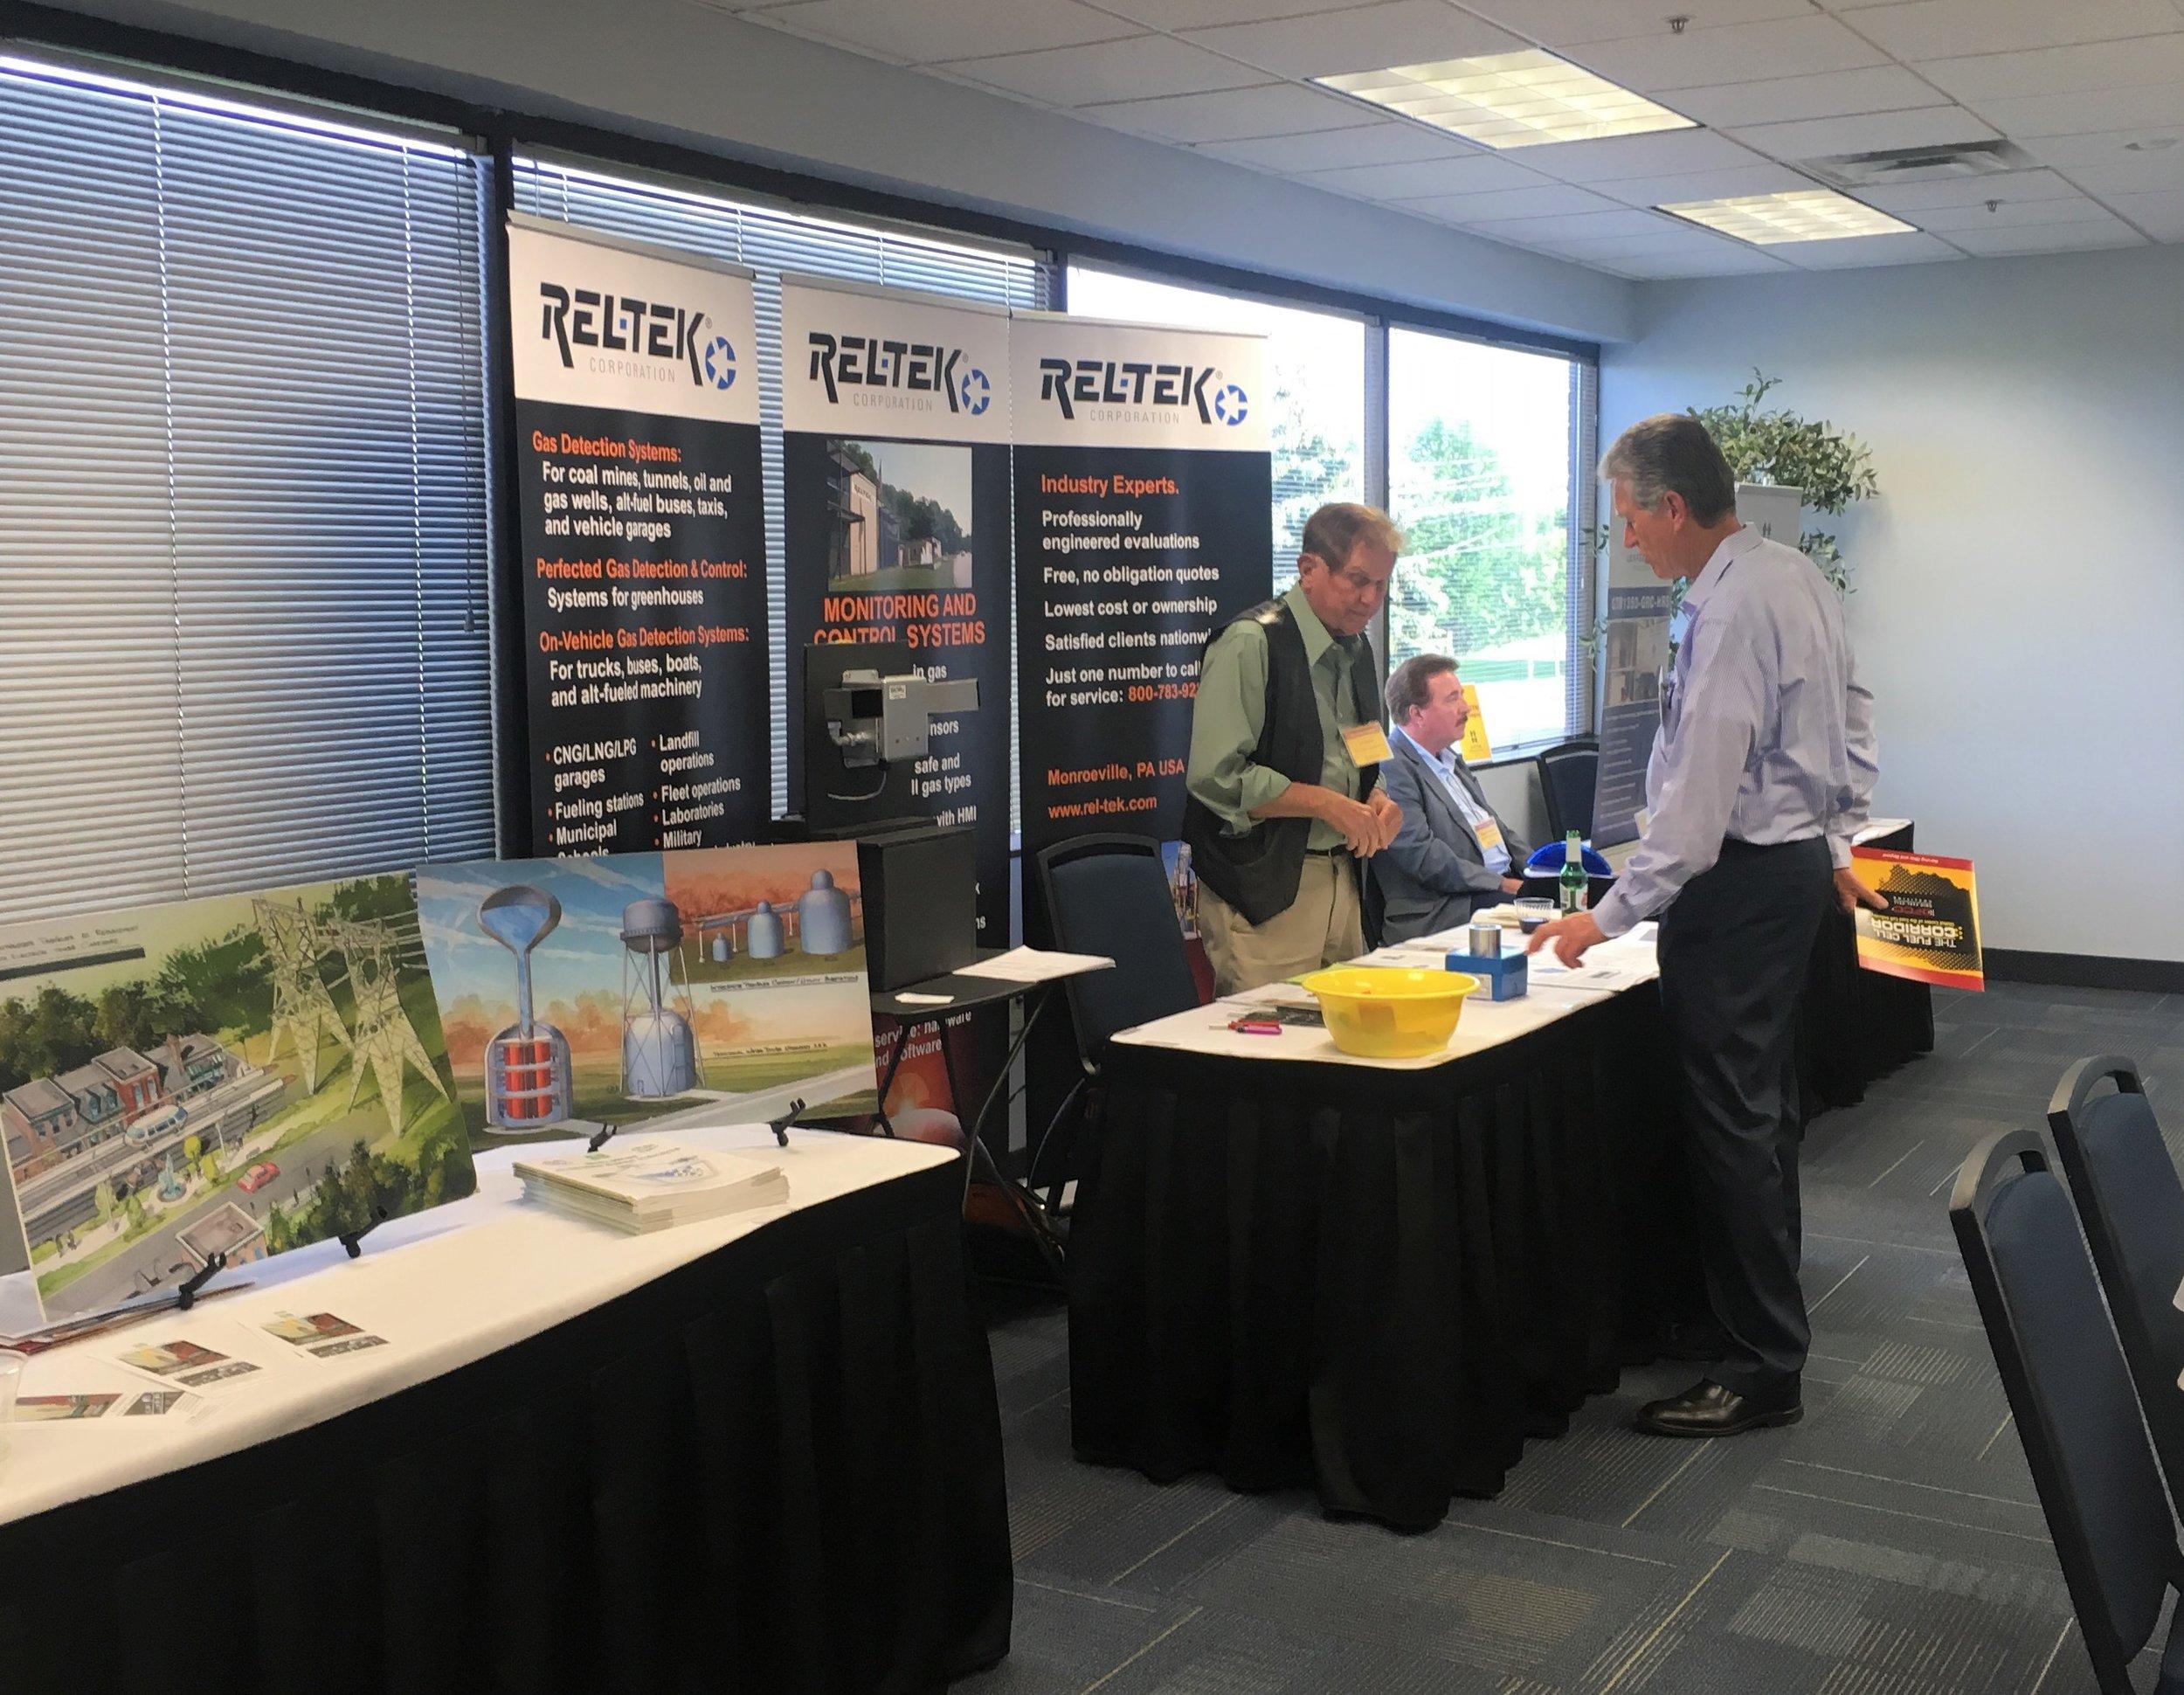 Interstate Traveler Co. & Rel-Tek exhibits